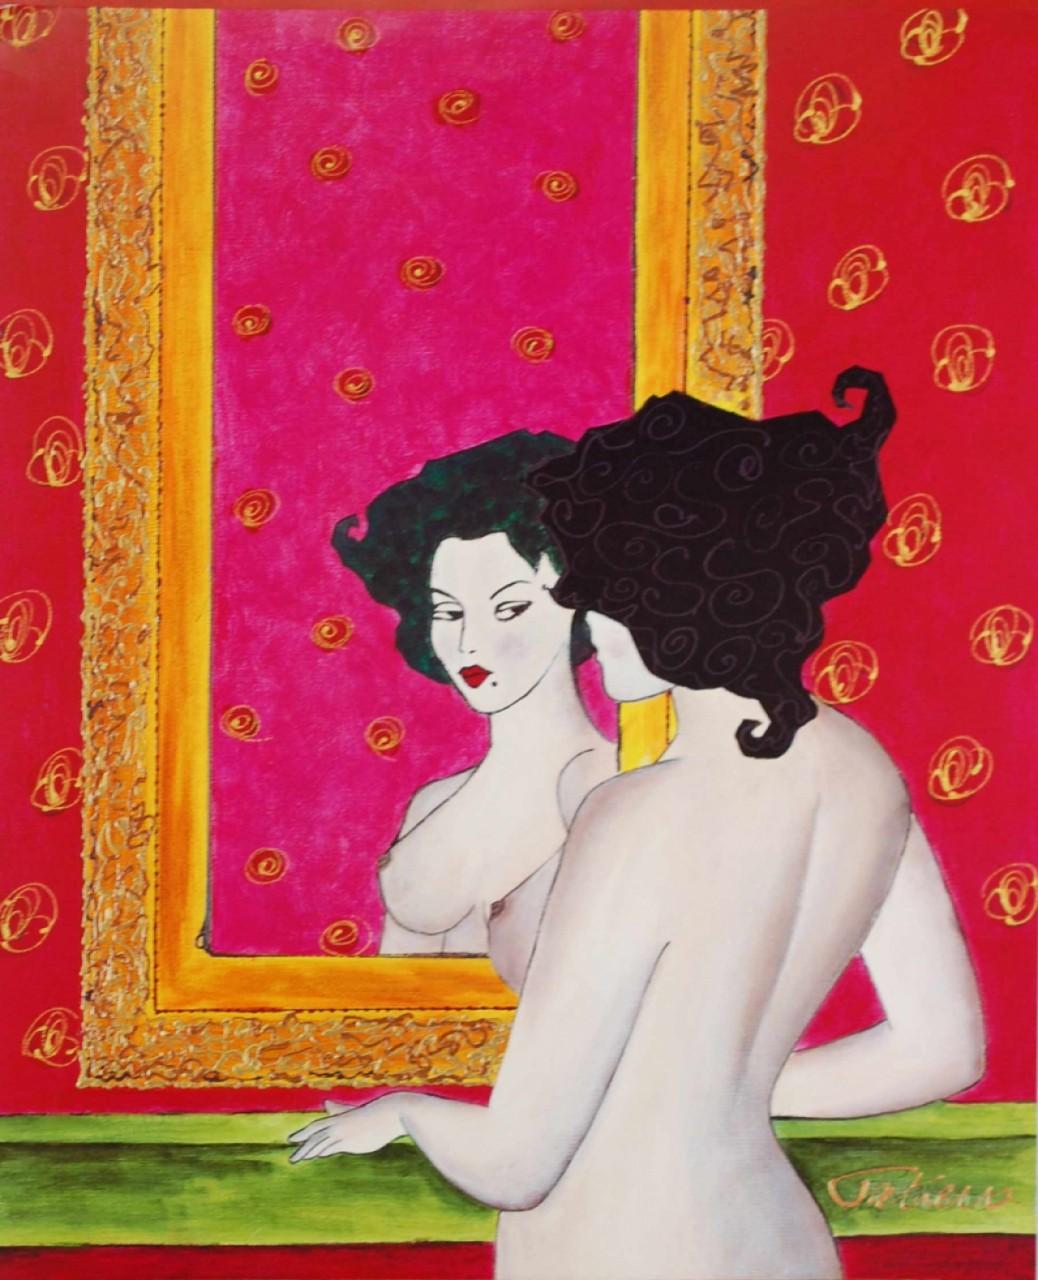 CATIERRA femme brune nue devant miroir